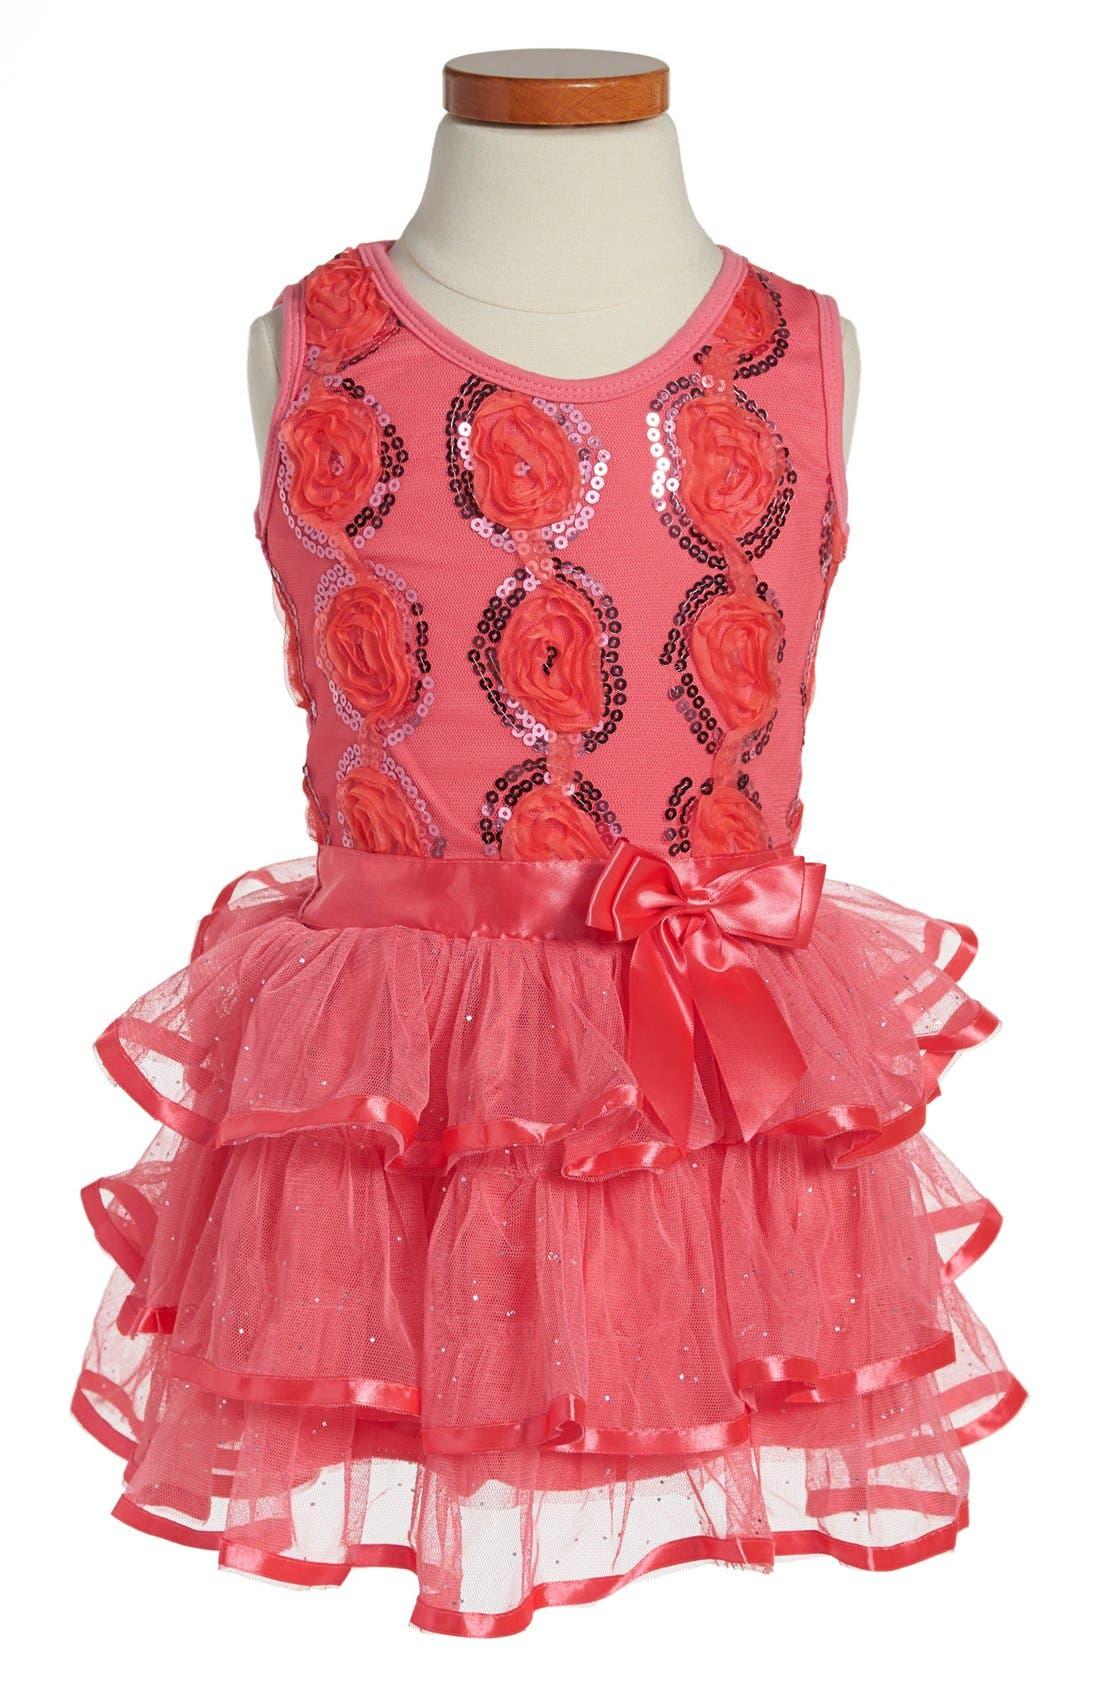 Alternate Image 1 Selected - Popatu Sequin Tiered Dress (Toddler Girls)